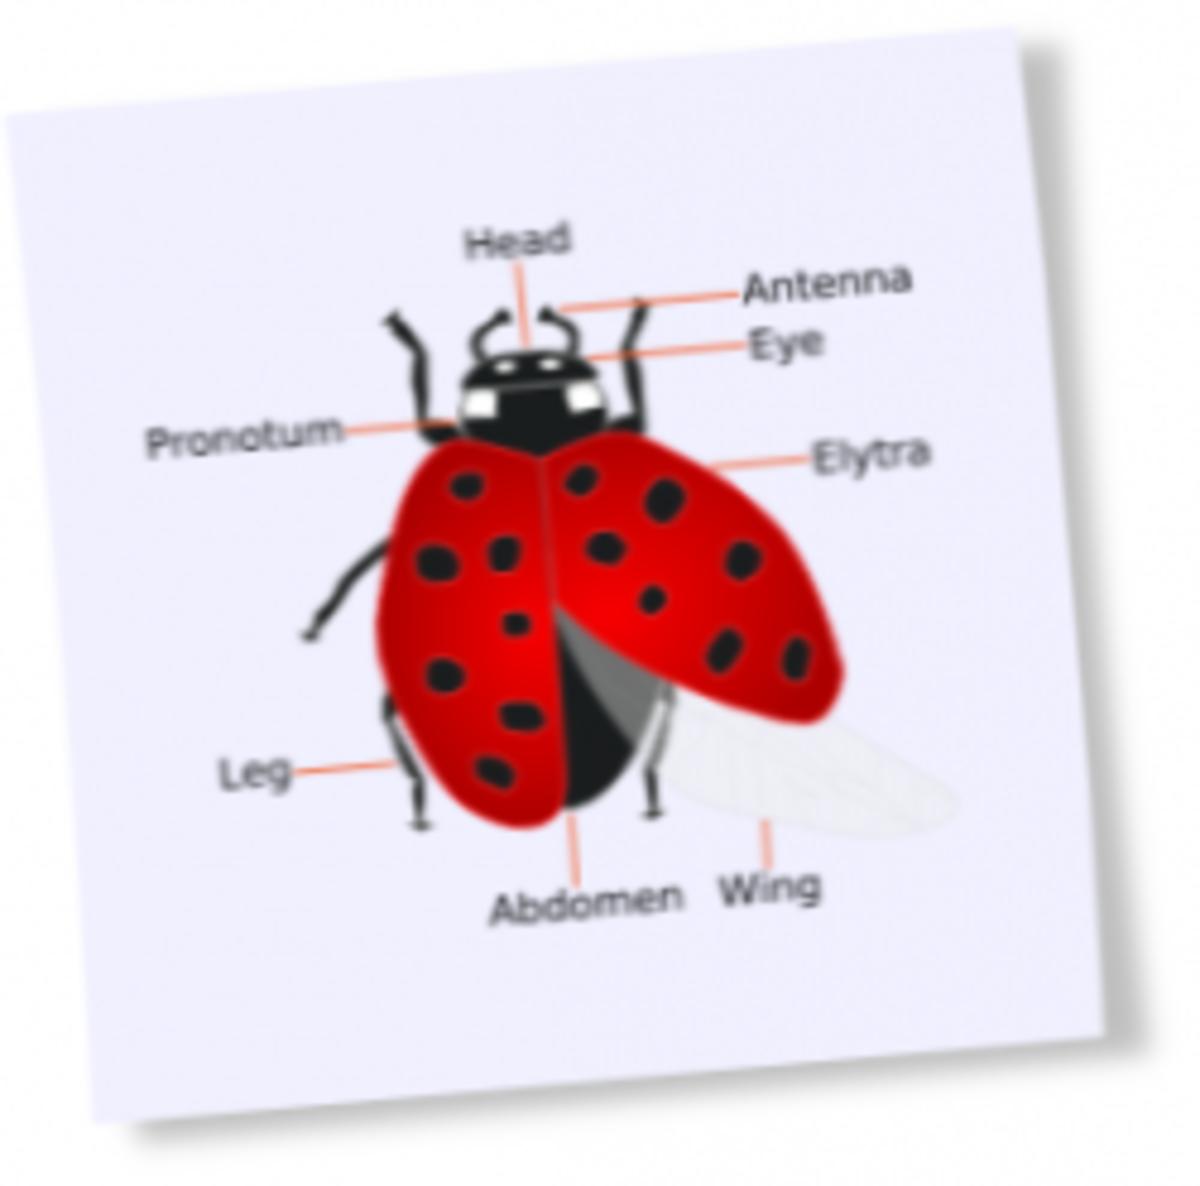 ladybug, diagram of a ladybug